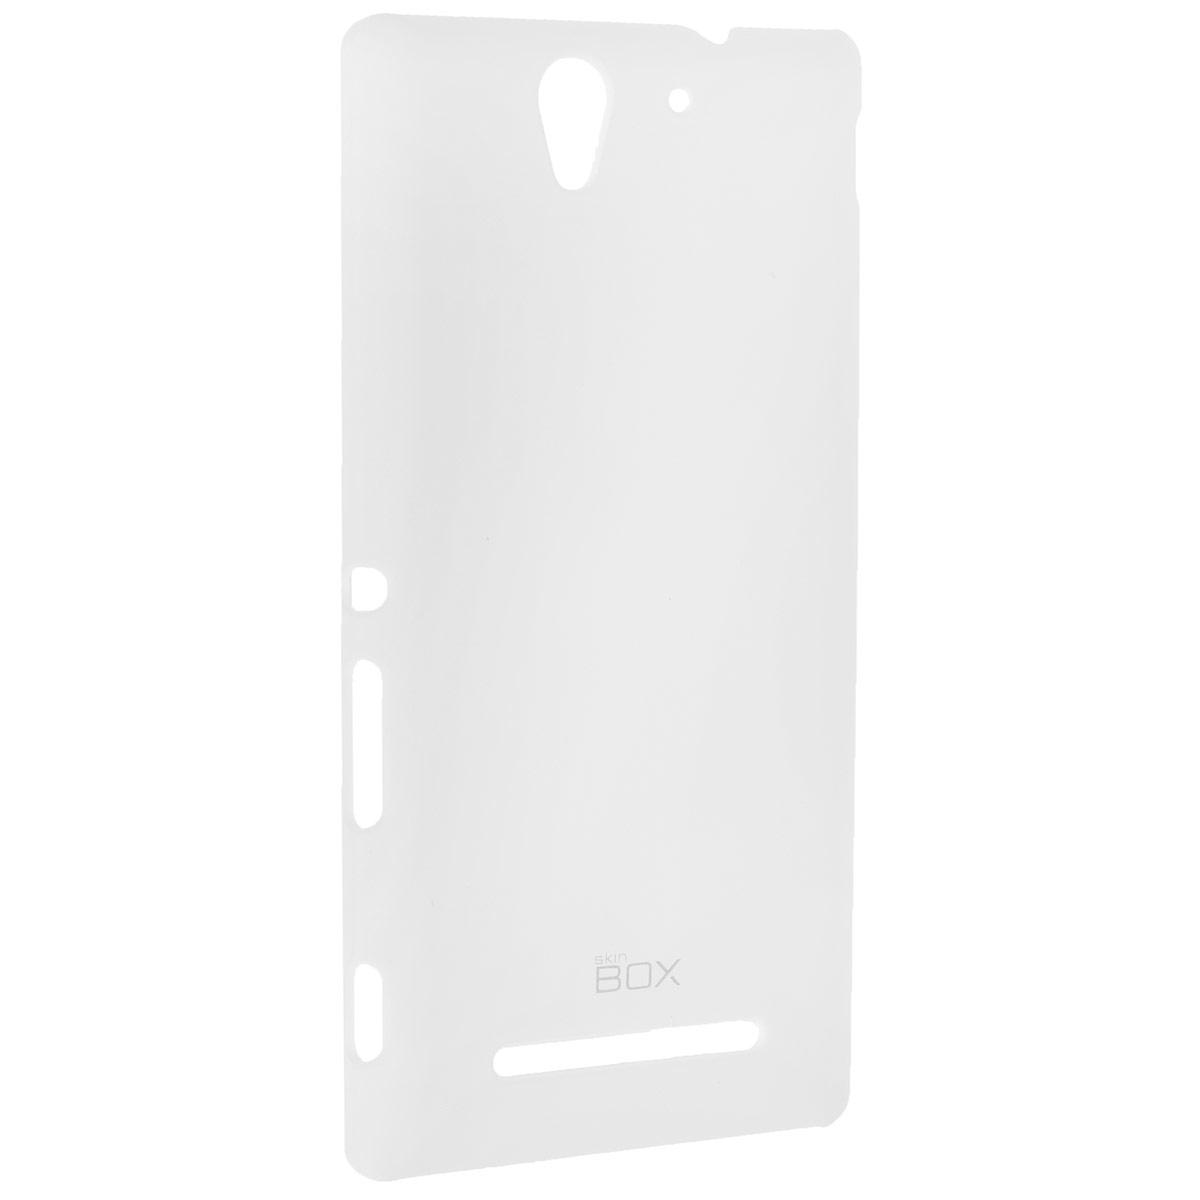 Skinbox Shield 4People чехол для Sony Xperia C3, White